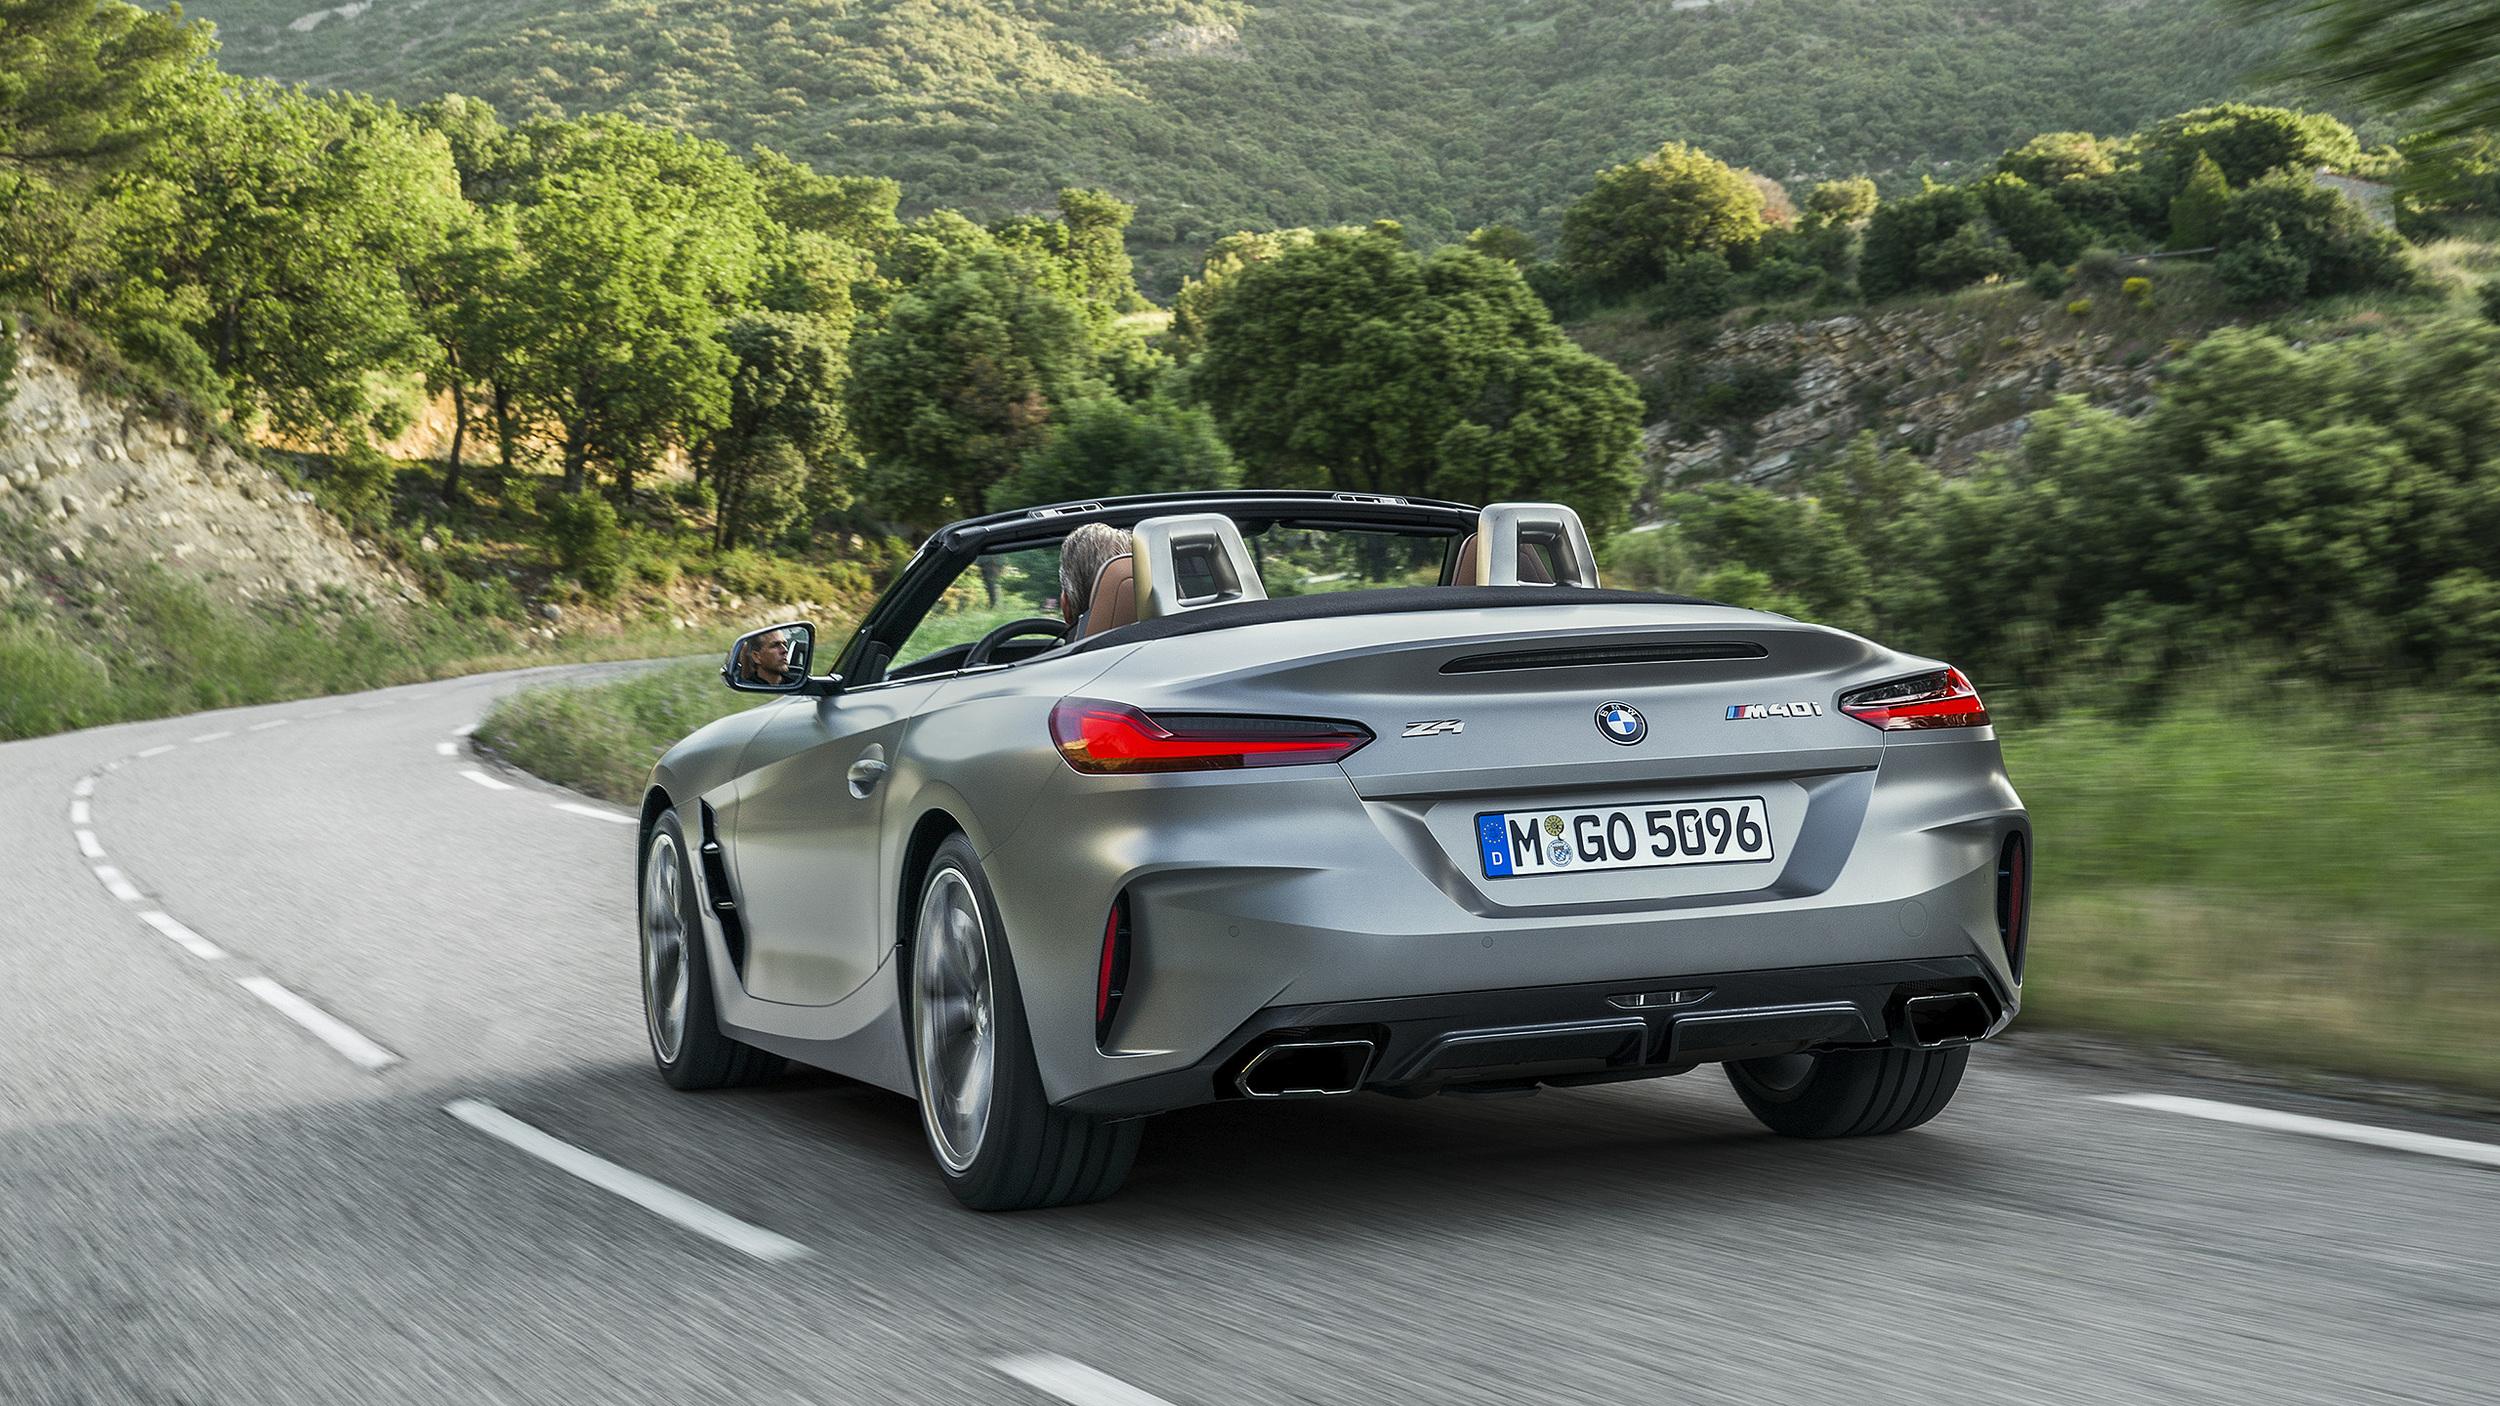 מתוחכם BMW releases updated 0-60-mph time for Z4 M40i, making it quicker QG-22